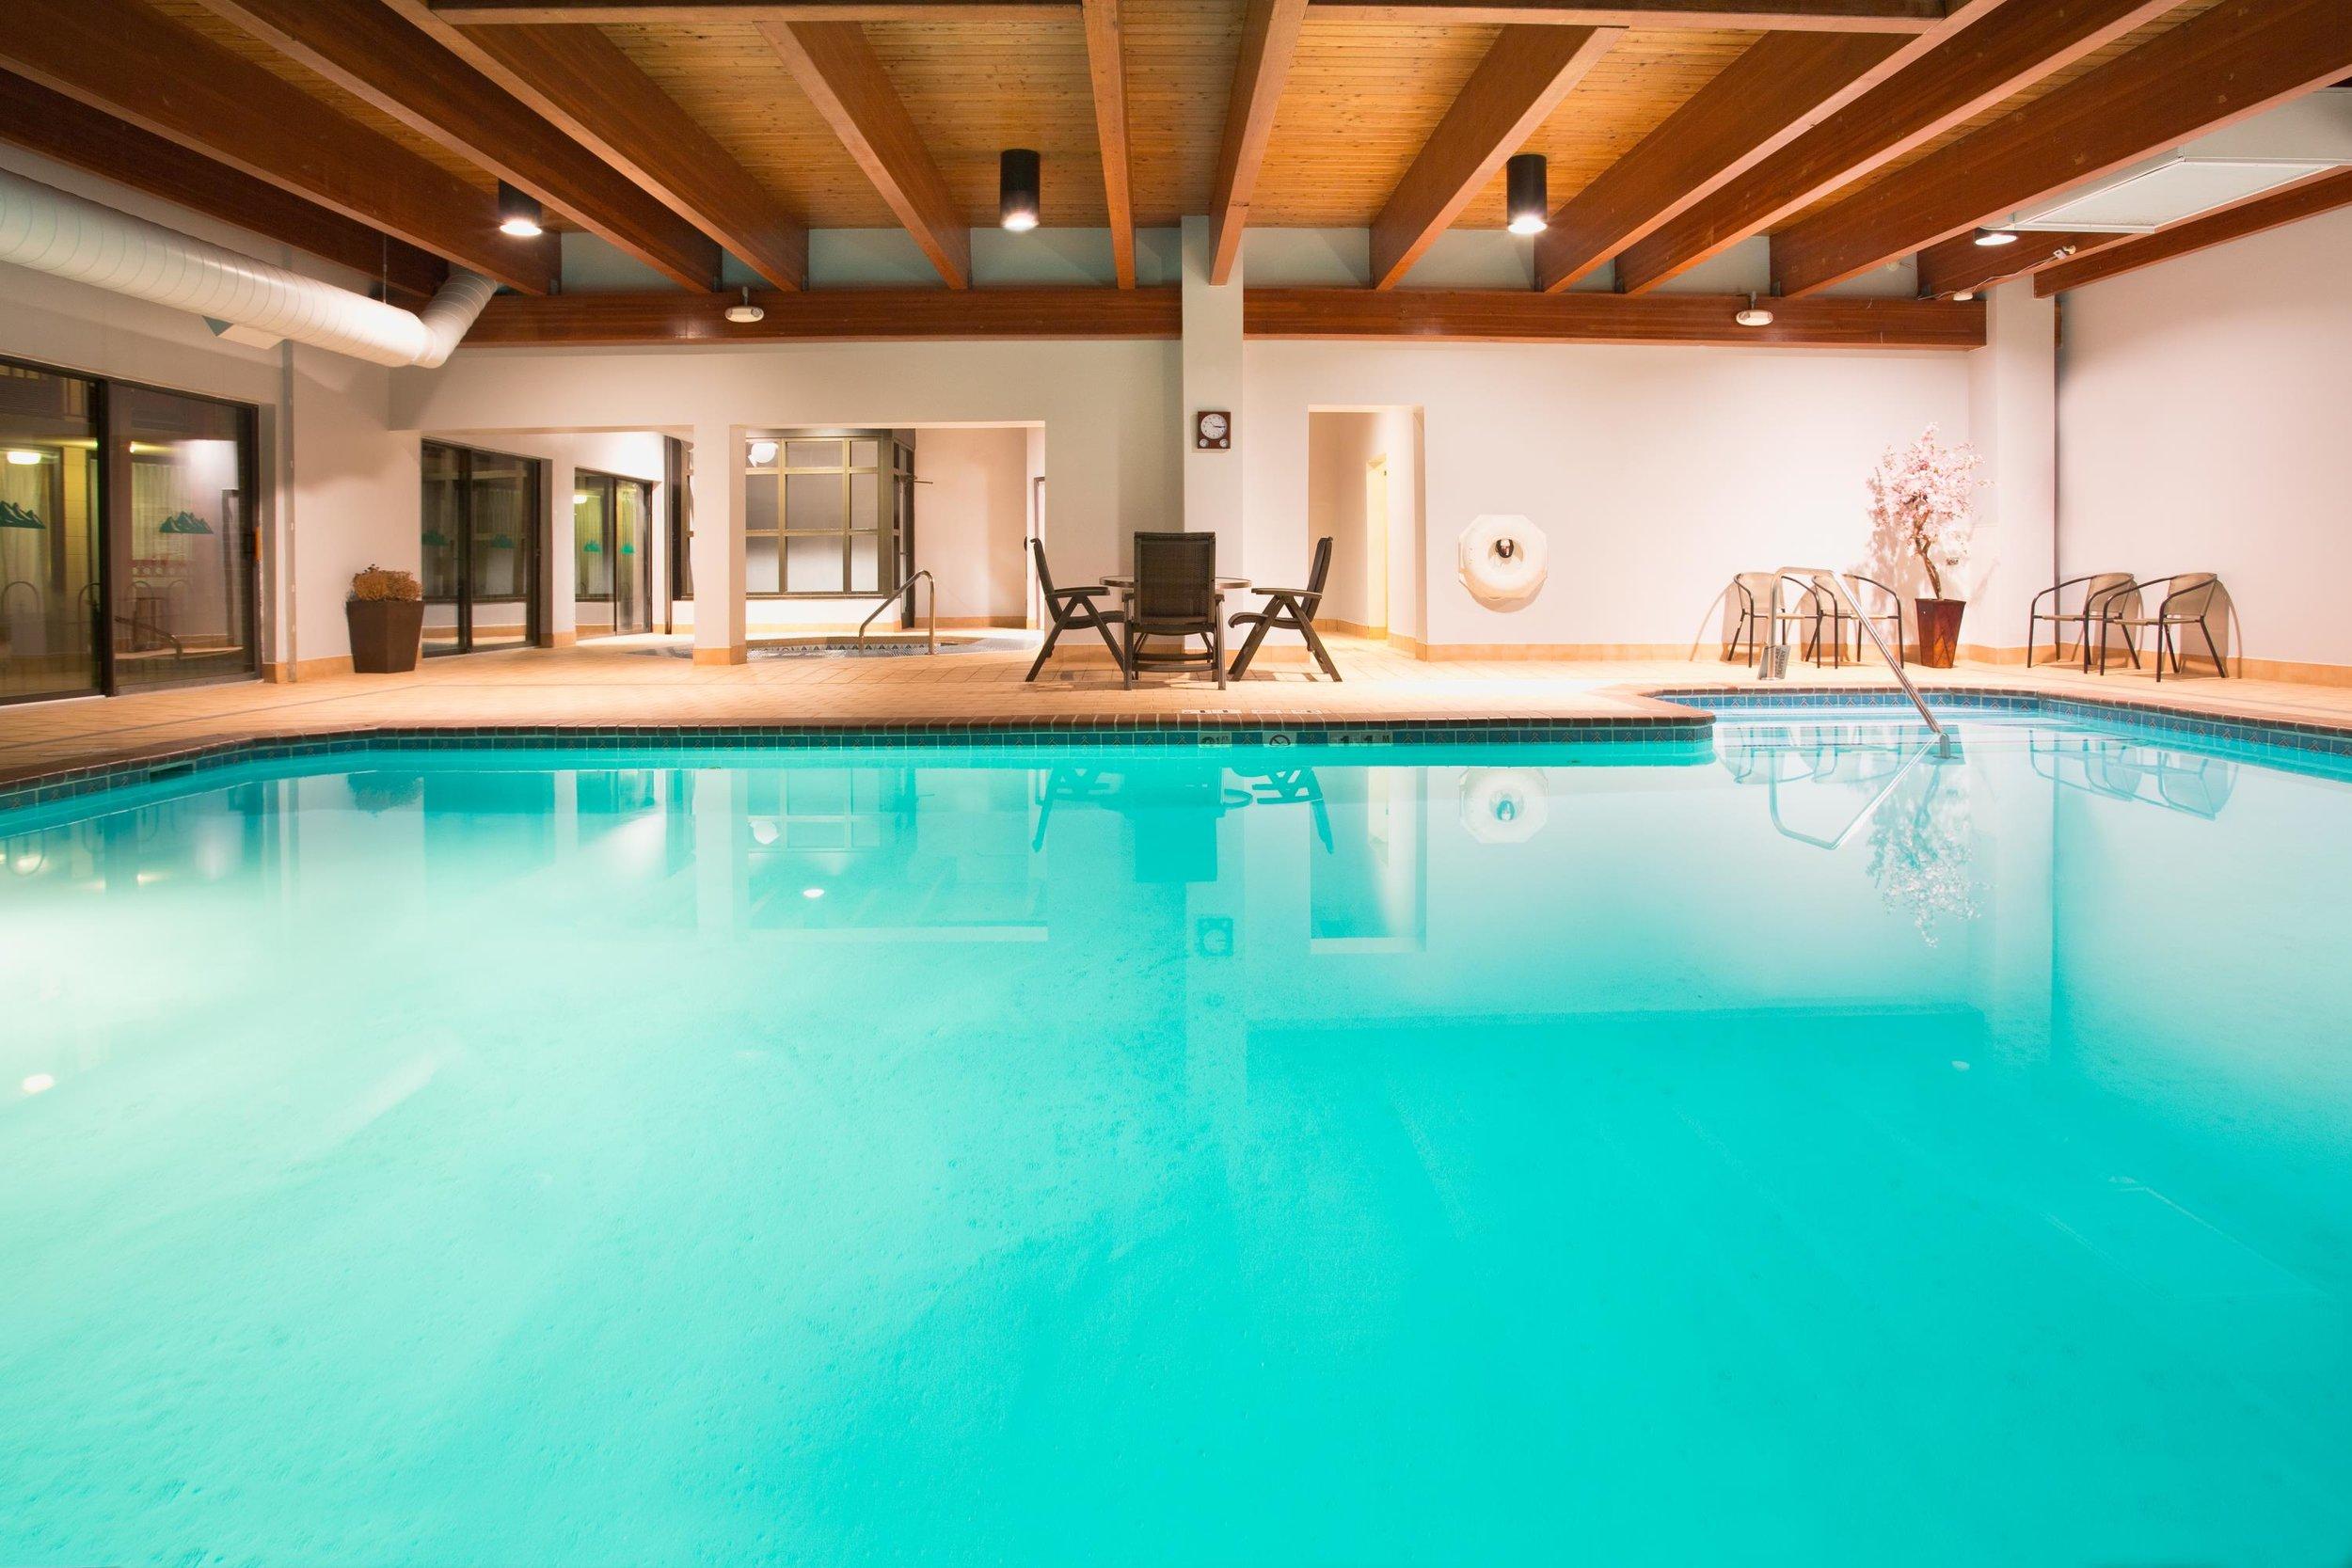 Durango_Downtown_Inn_Pool.jpg